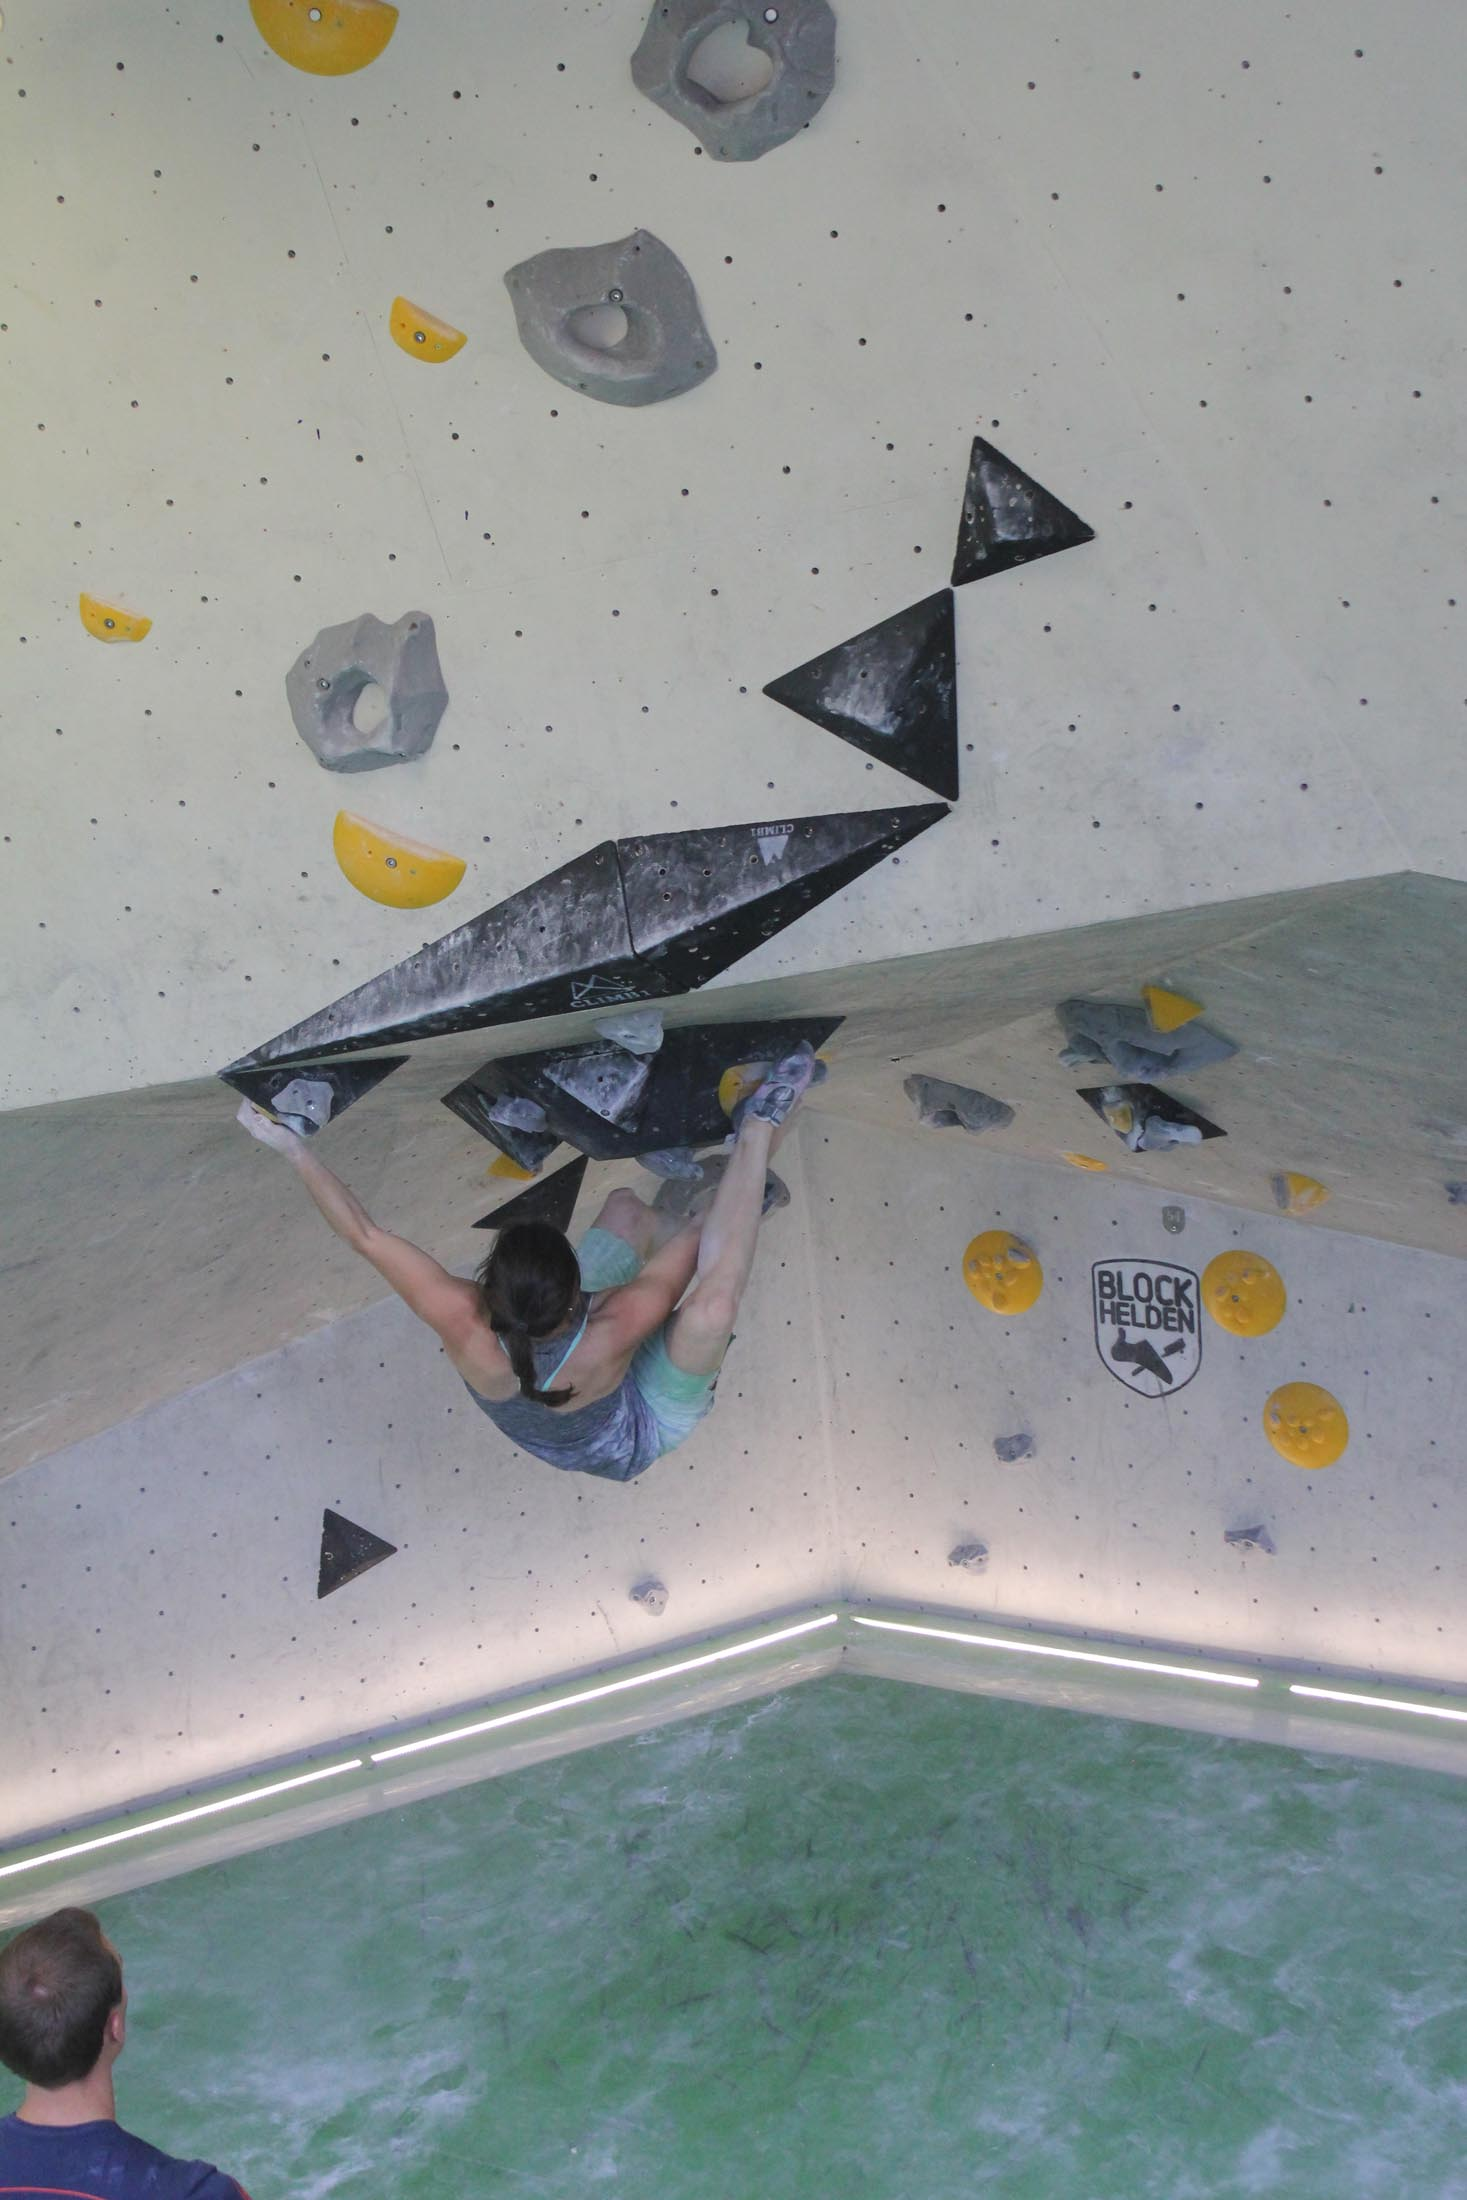 Juliane Wurm, internationaler bouldercup Frankenjura, BLOCKHELDEN Erlangen, Bergfreunde.de, Mammut07092016013